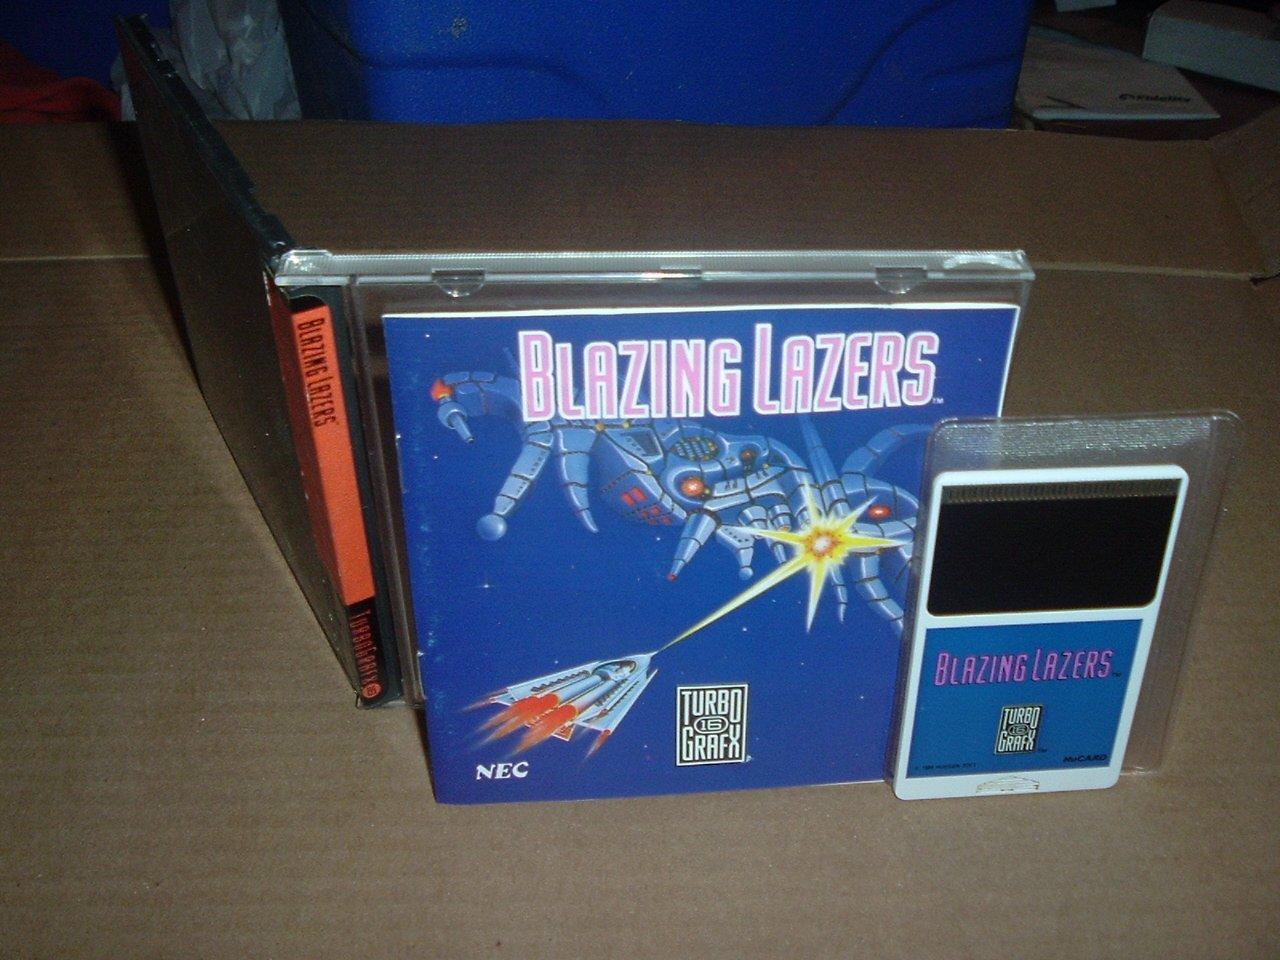 Amazon.com: Blazing Lazers: Video Games